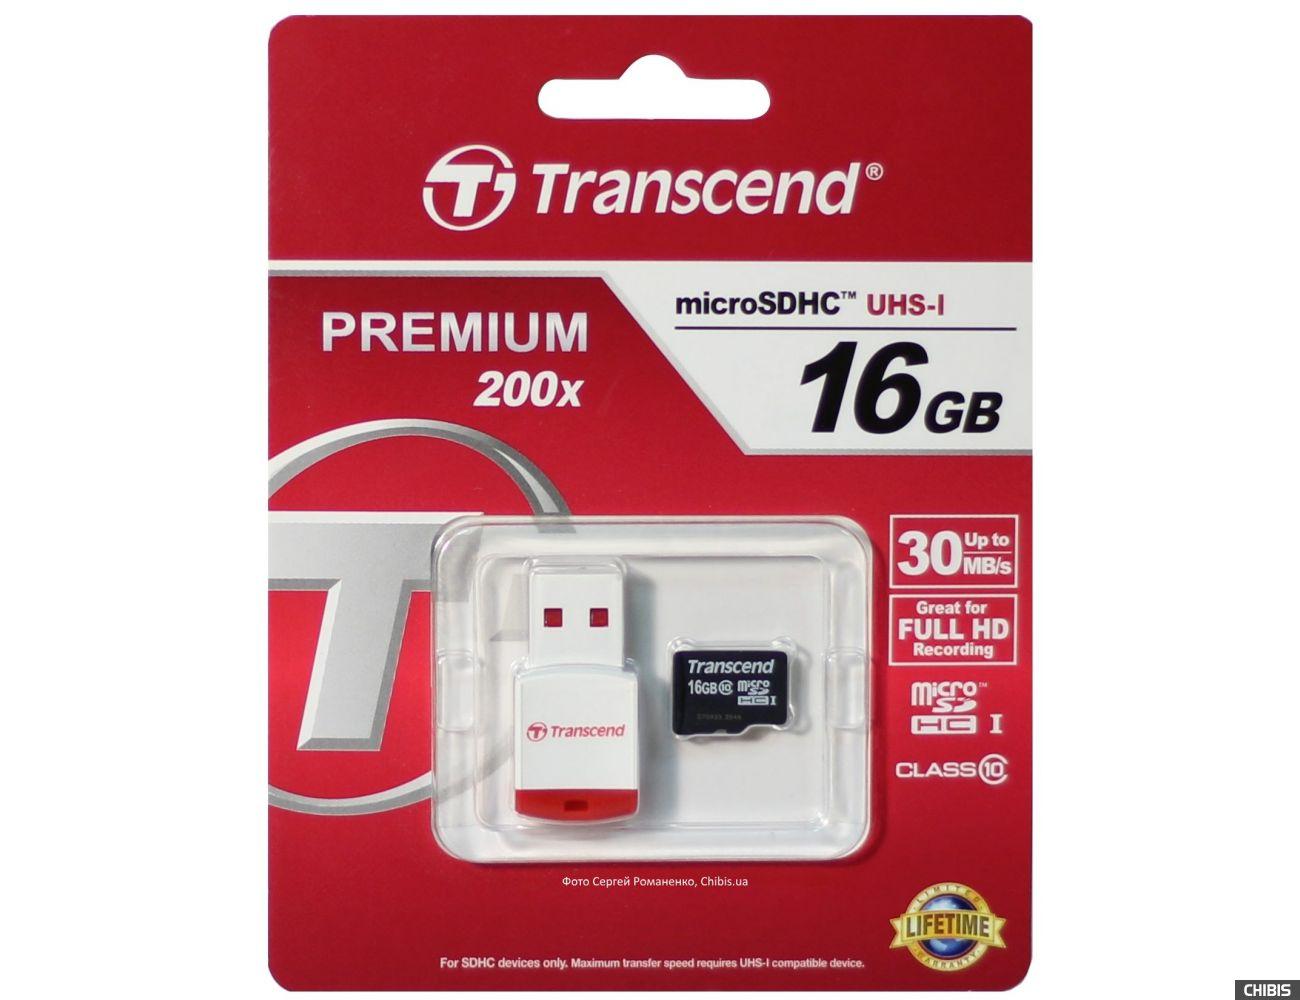 Карта памяти Transcend MicroSDHC 16Gb Class 10 200x с кардридером